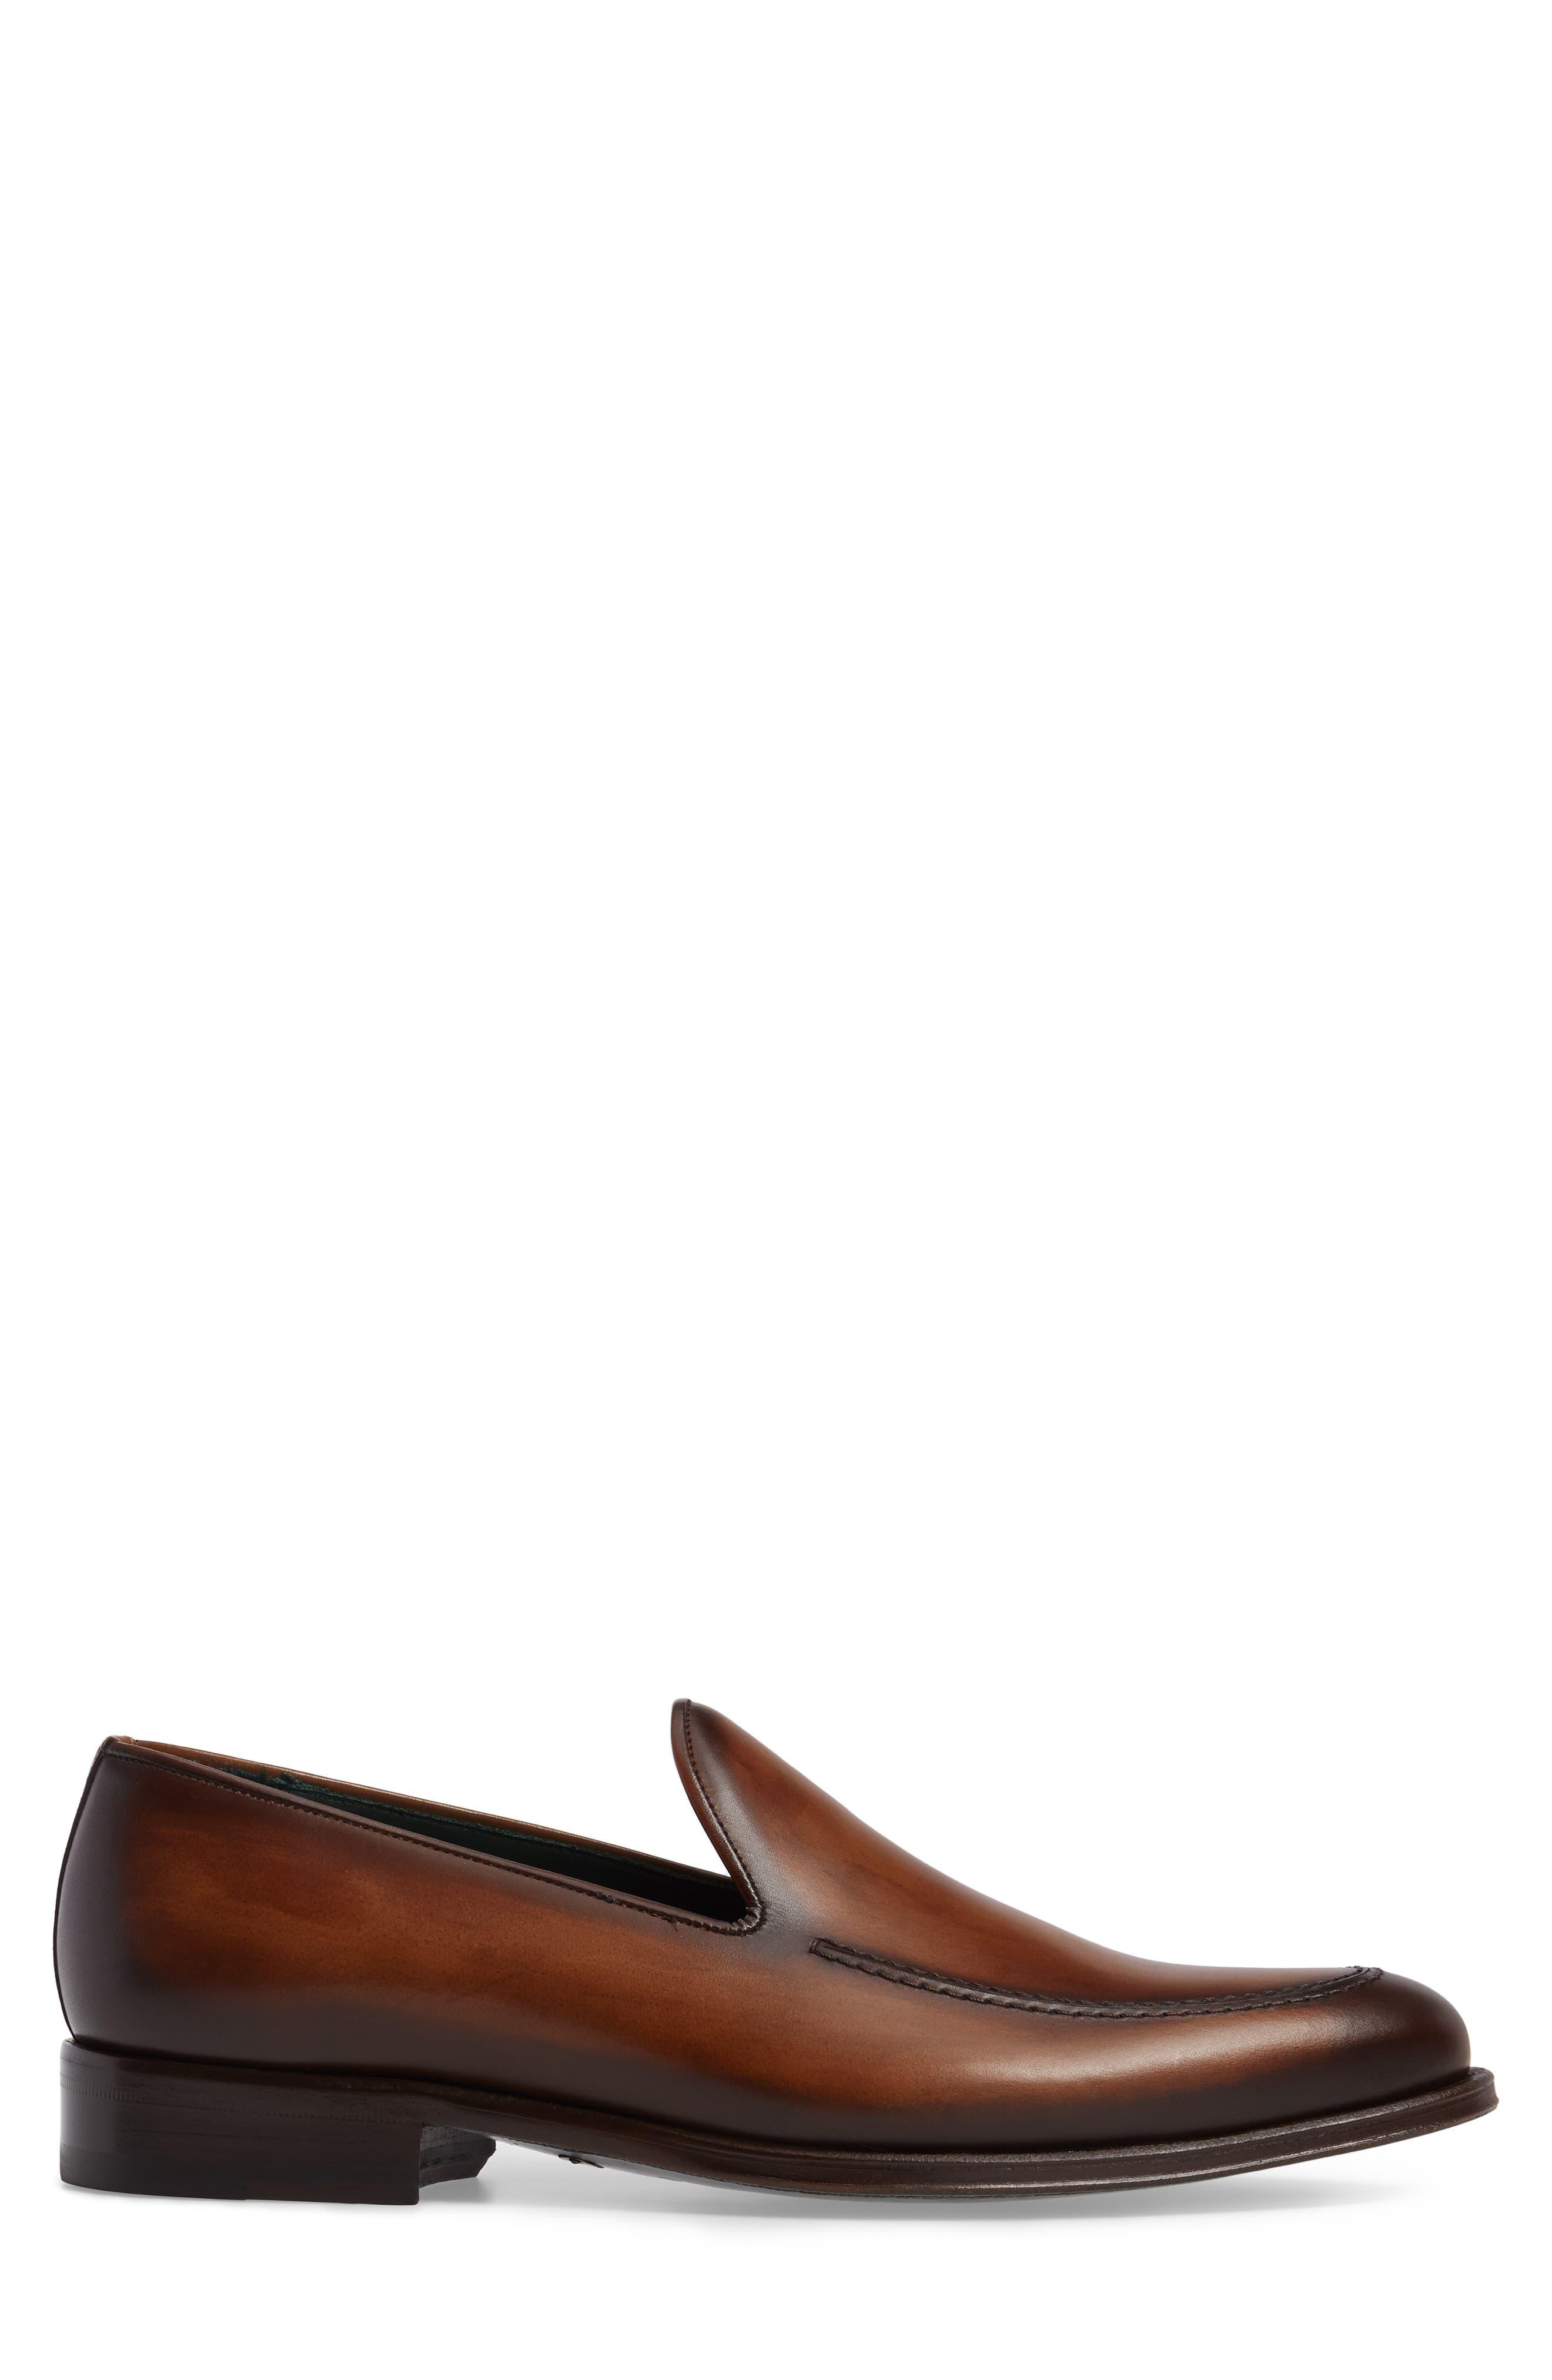 Rodin Apron Toe Loafer,                             Alternate thumbnail 3, color,                             Cognac Leather